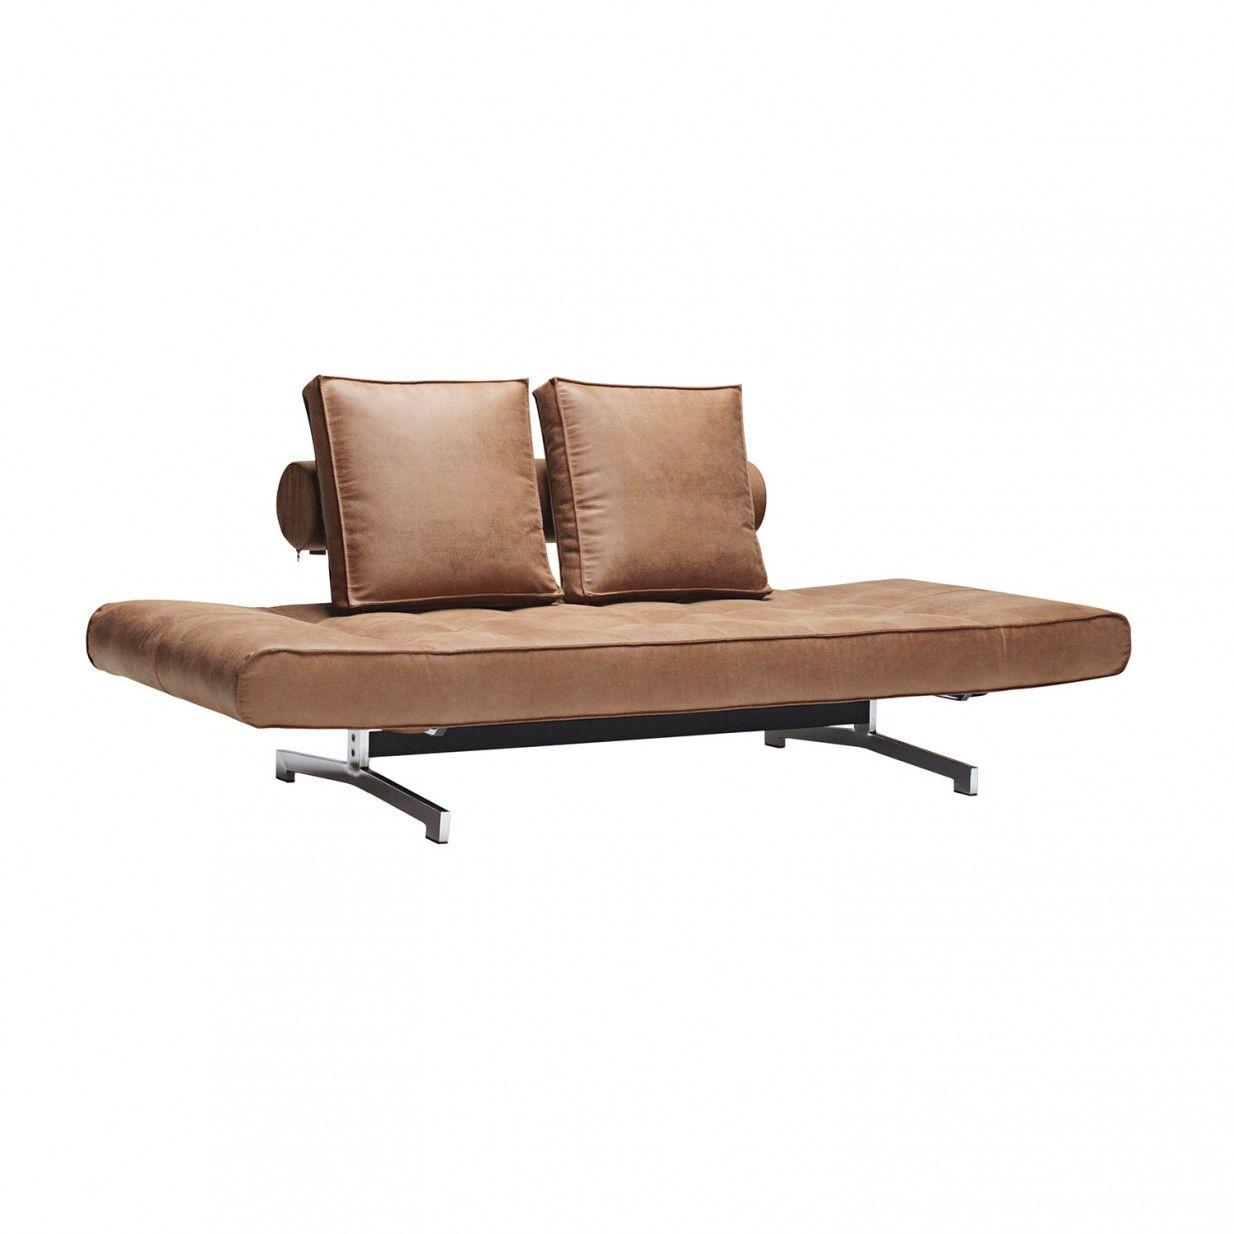 Genial Schlafsofa 120x200 Dekoration Von Ghia - Braun | Innovation Living